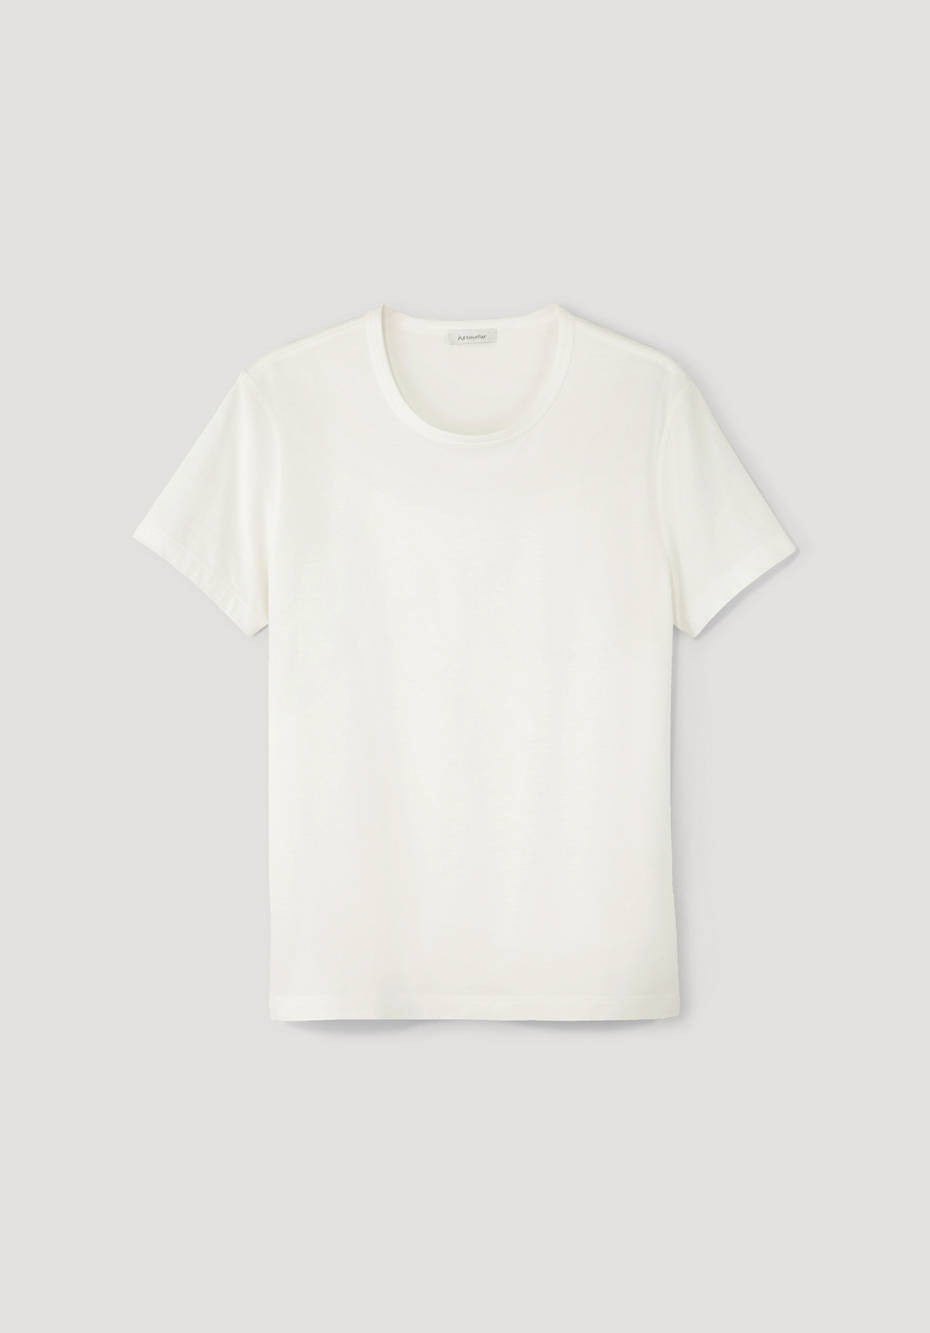 Shirt made from pure organic pima cotton